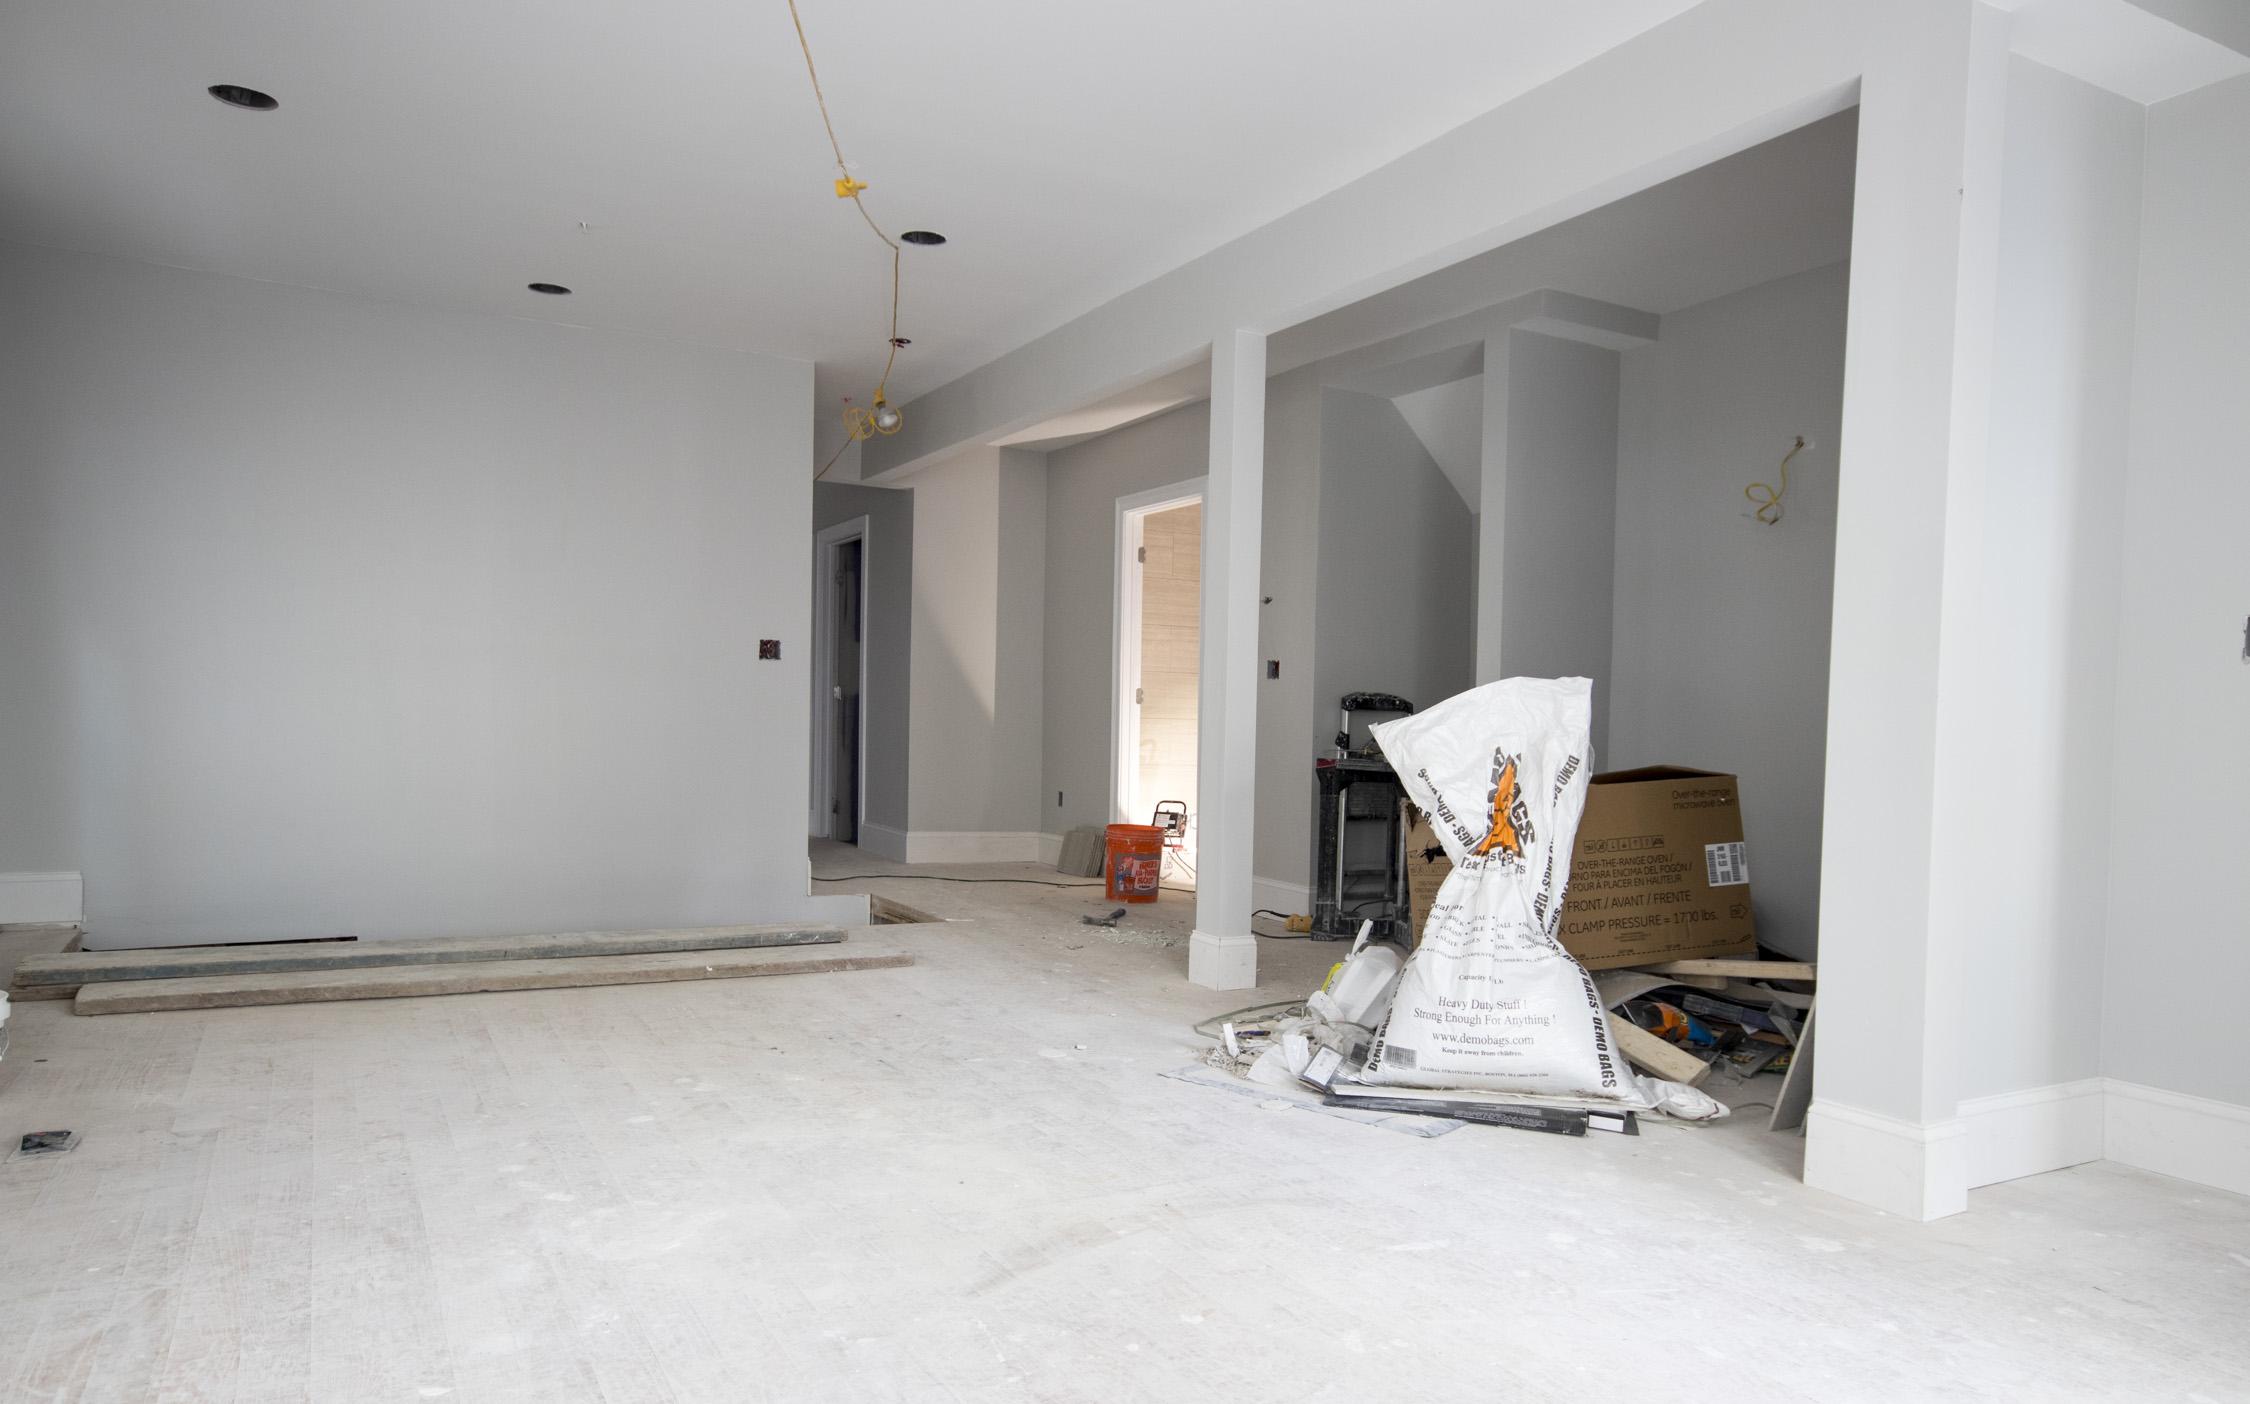 P. Northeast Contractors 27 Darling Street Boston Condo Renovation_1